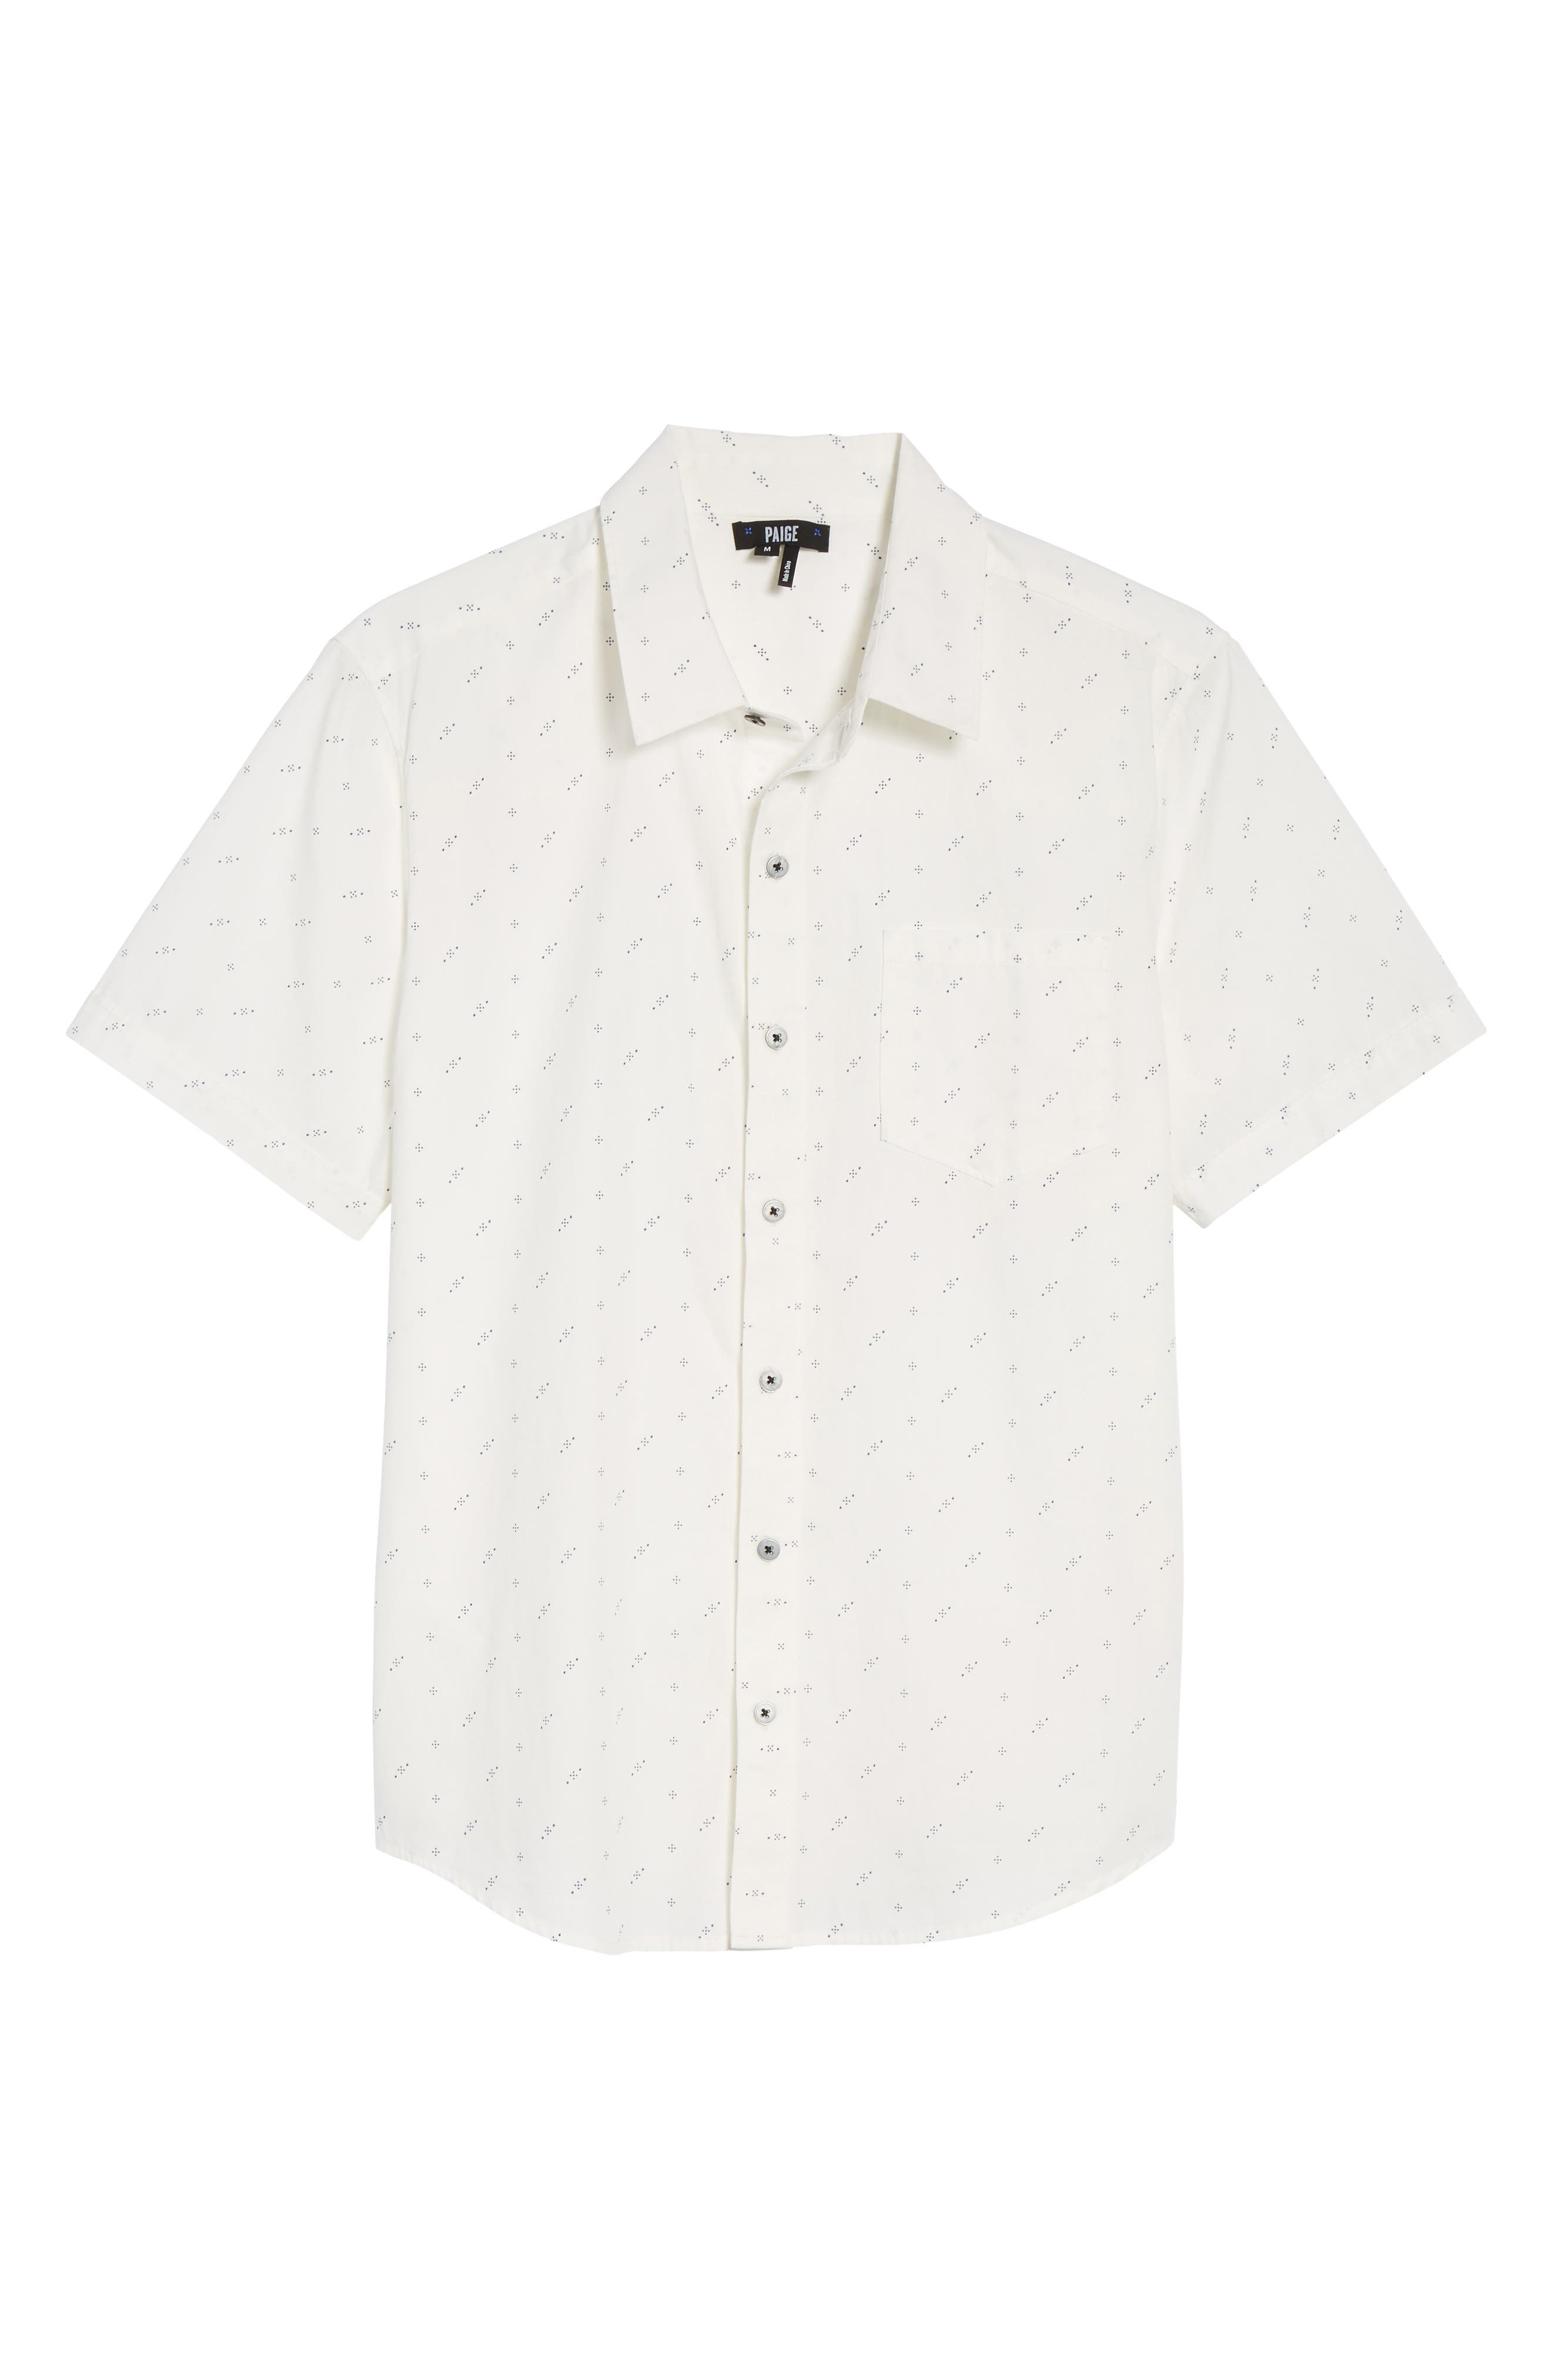 Becker Dot Print Woven Shirt,                             Alternate thumbnail 6, color,                             140